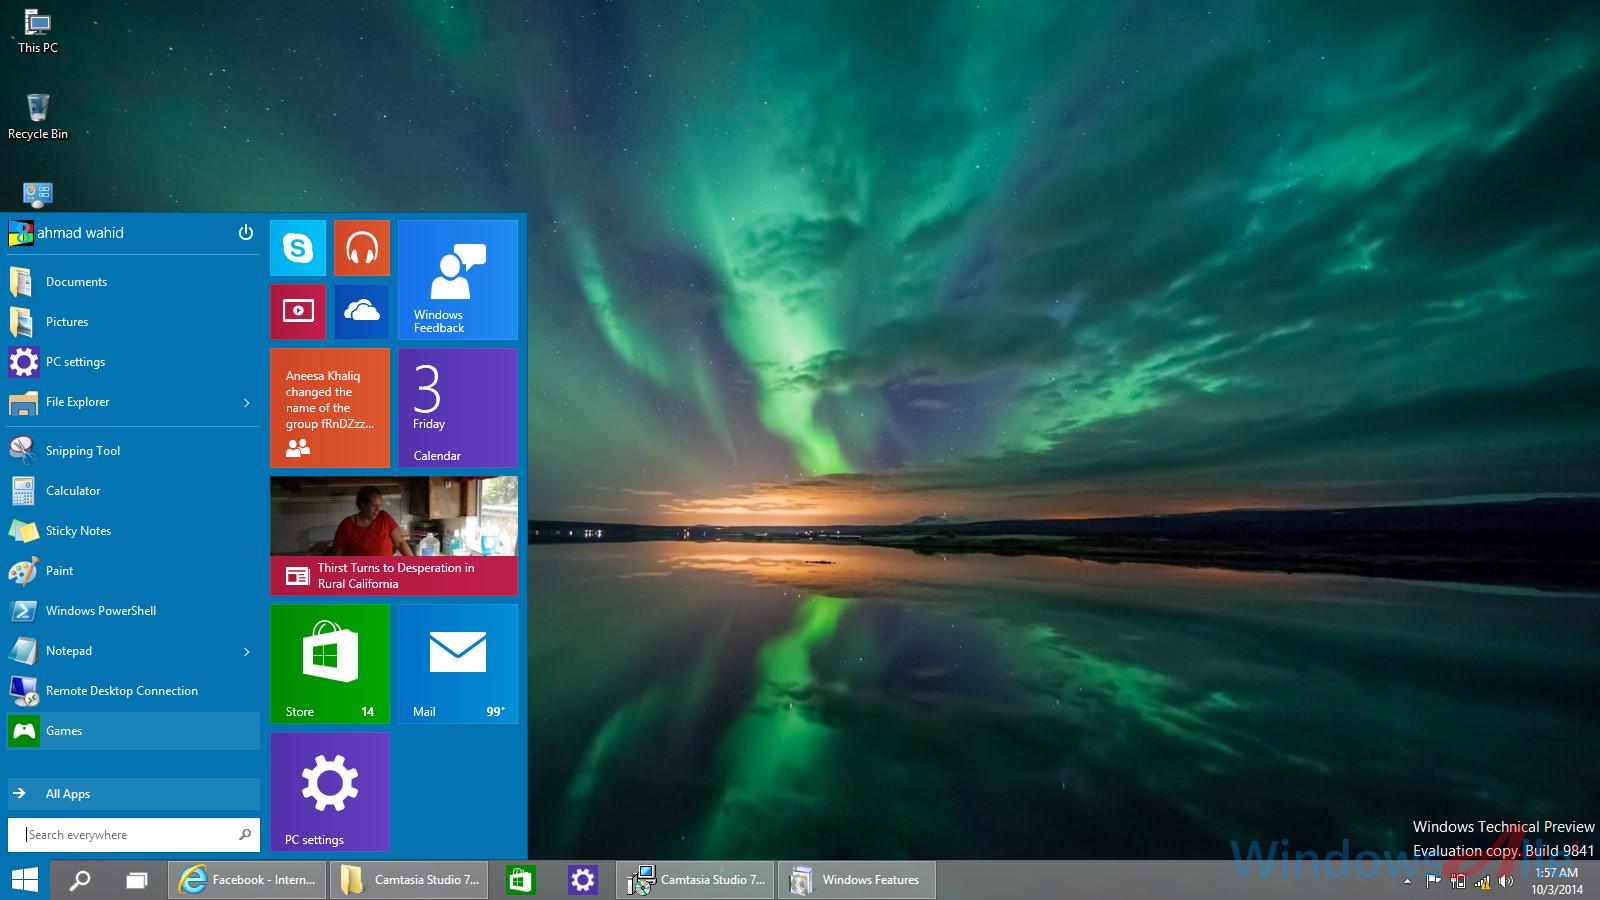 Windows 10 Technical Preview Walkthrough of Start Menu multi 1600x900